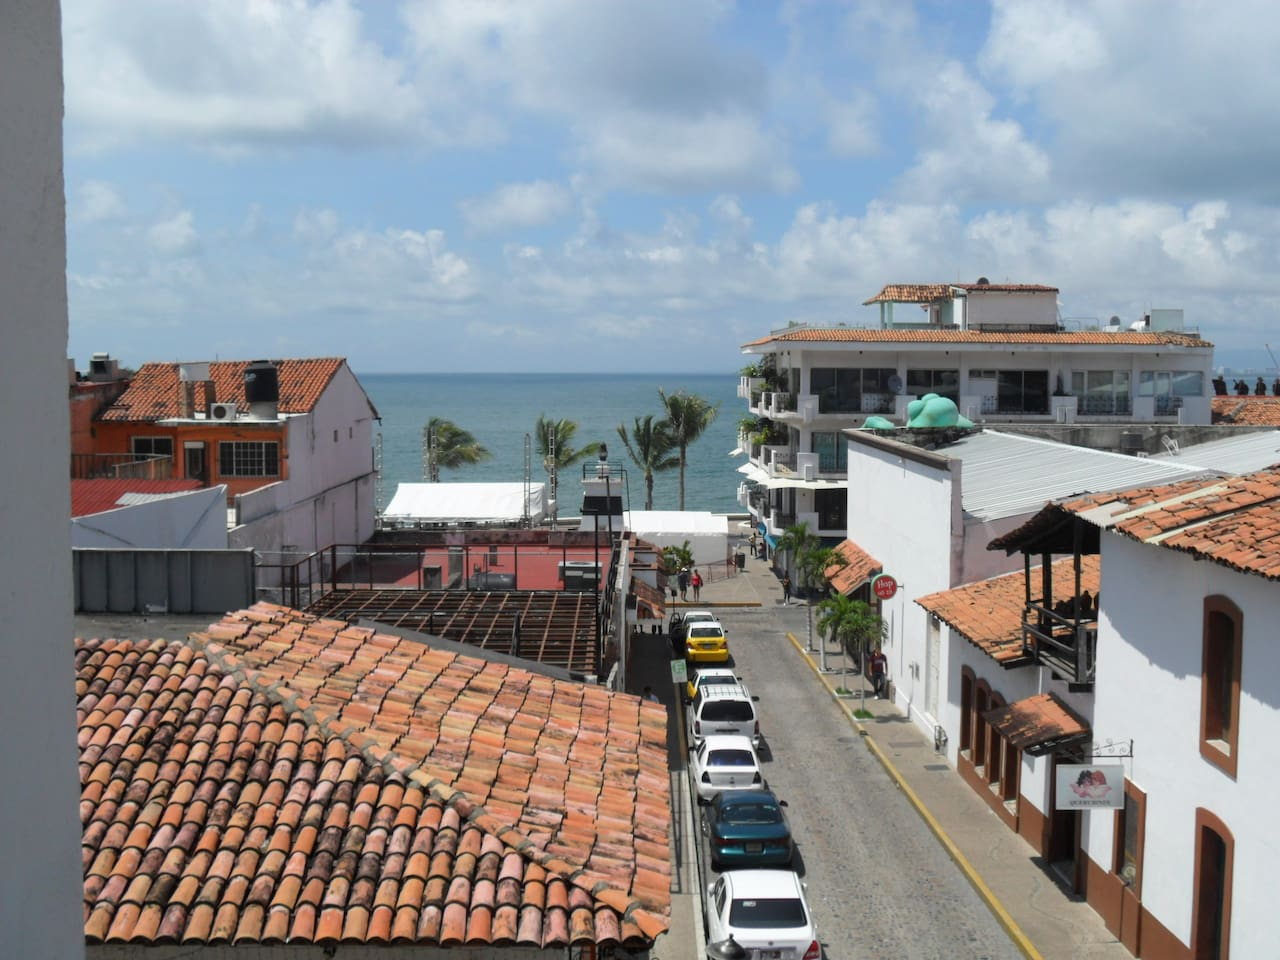 Vista de Terraza / View from Terrace